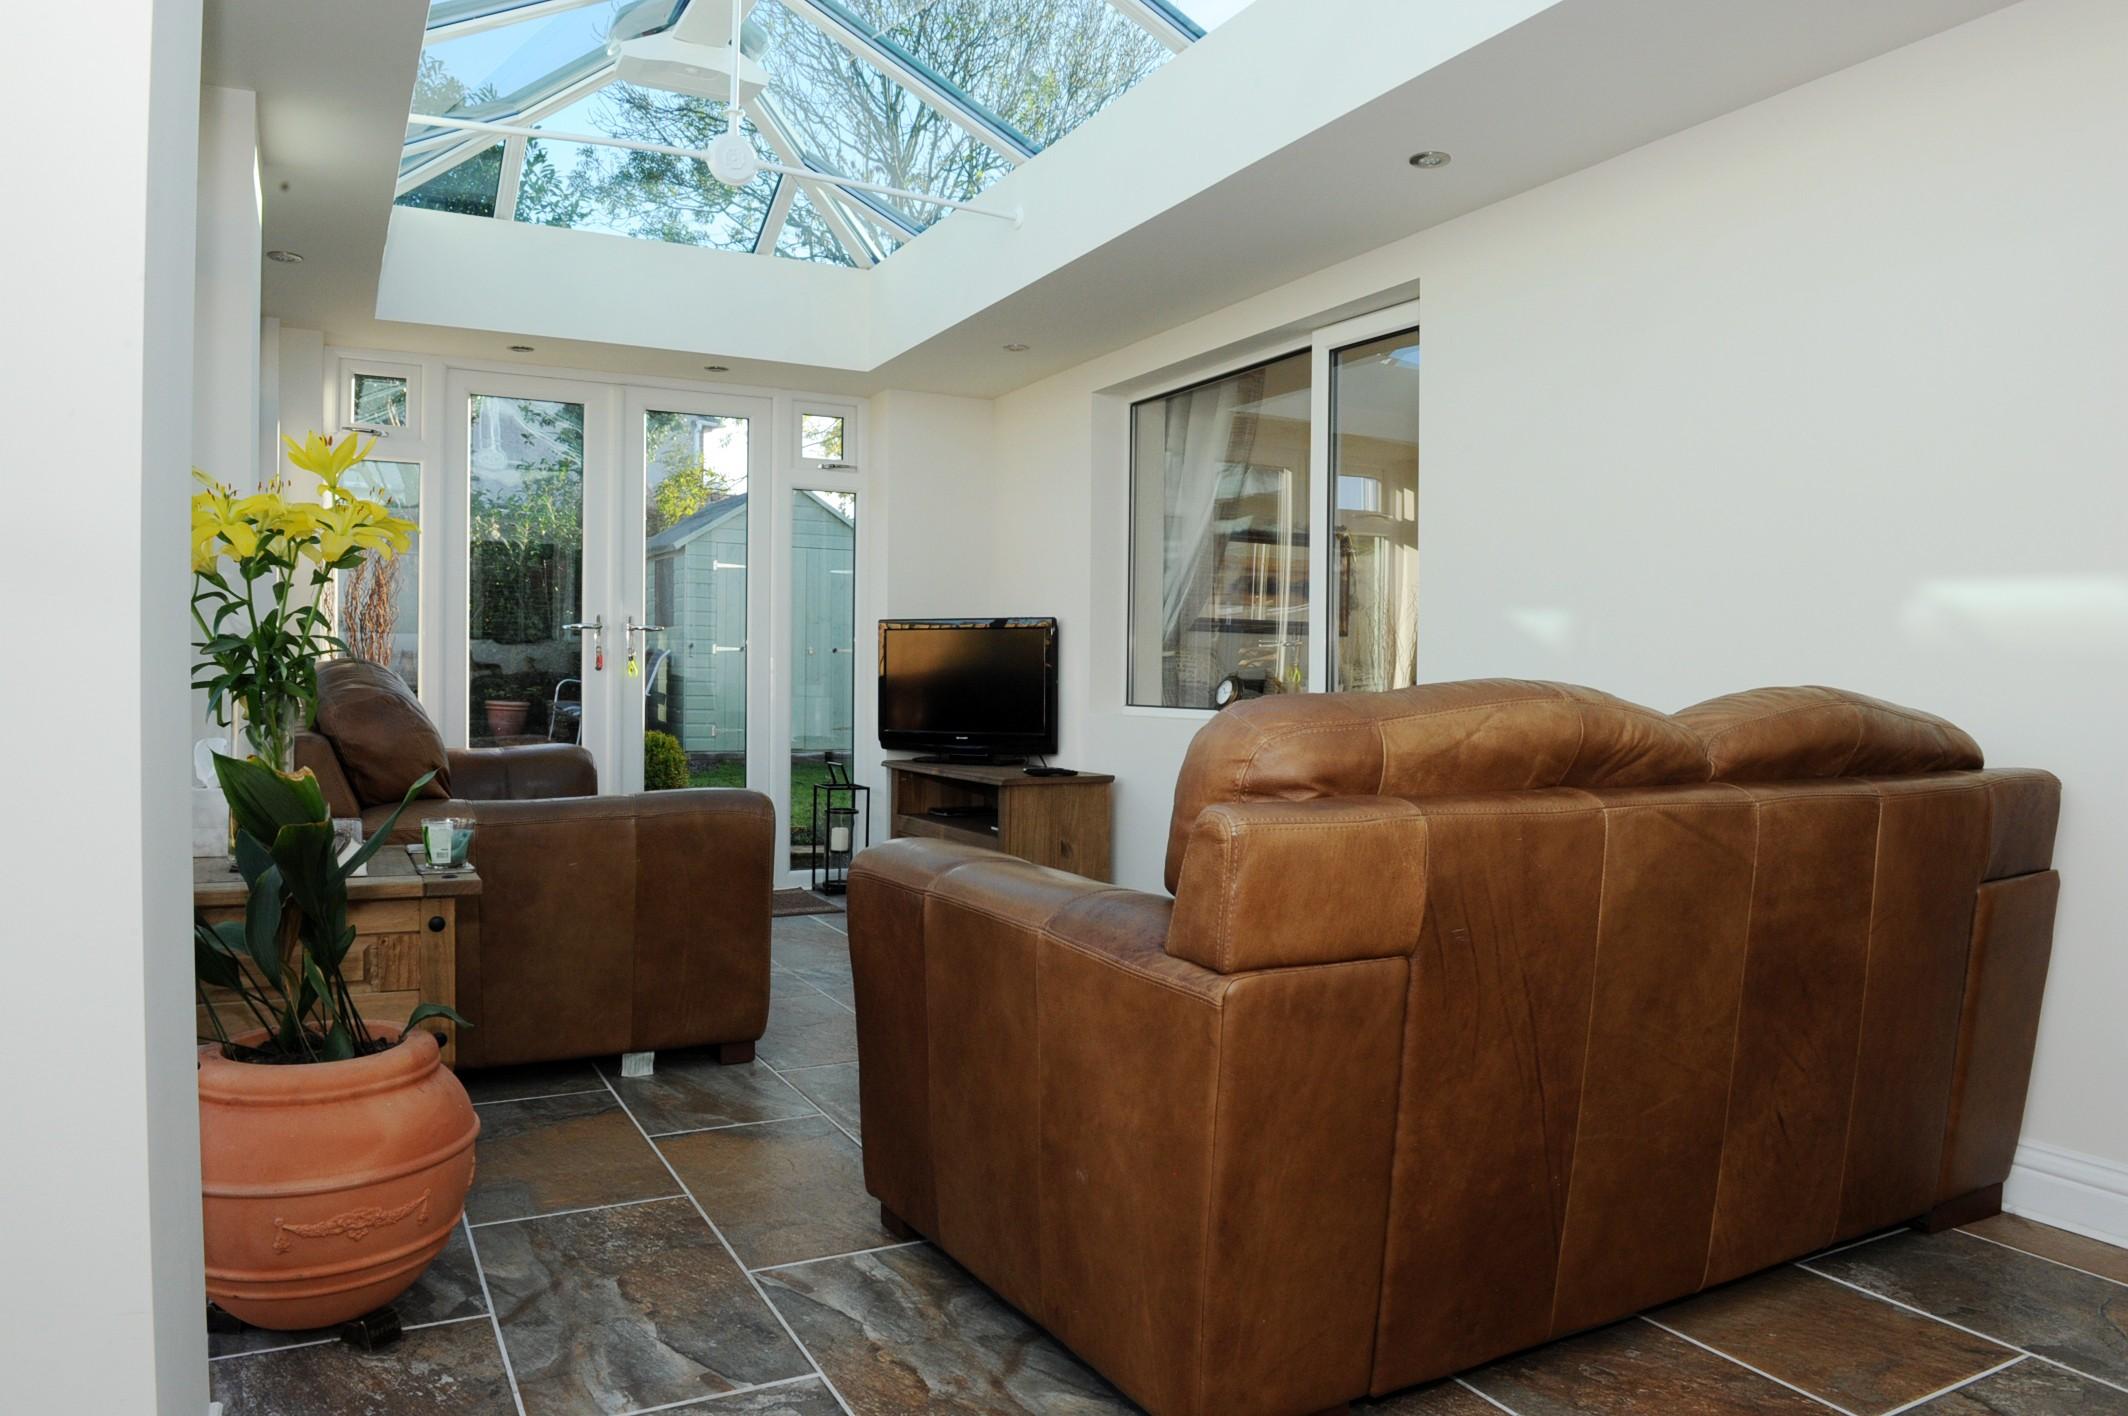 house extension ideas market weighton